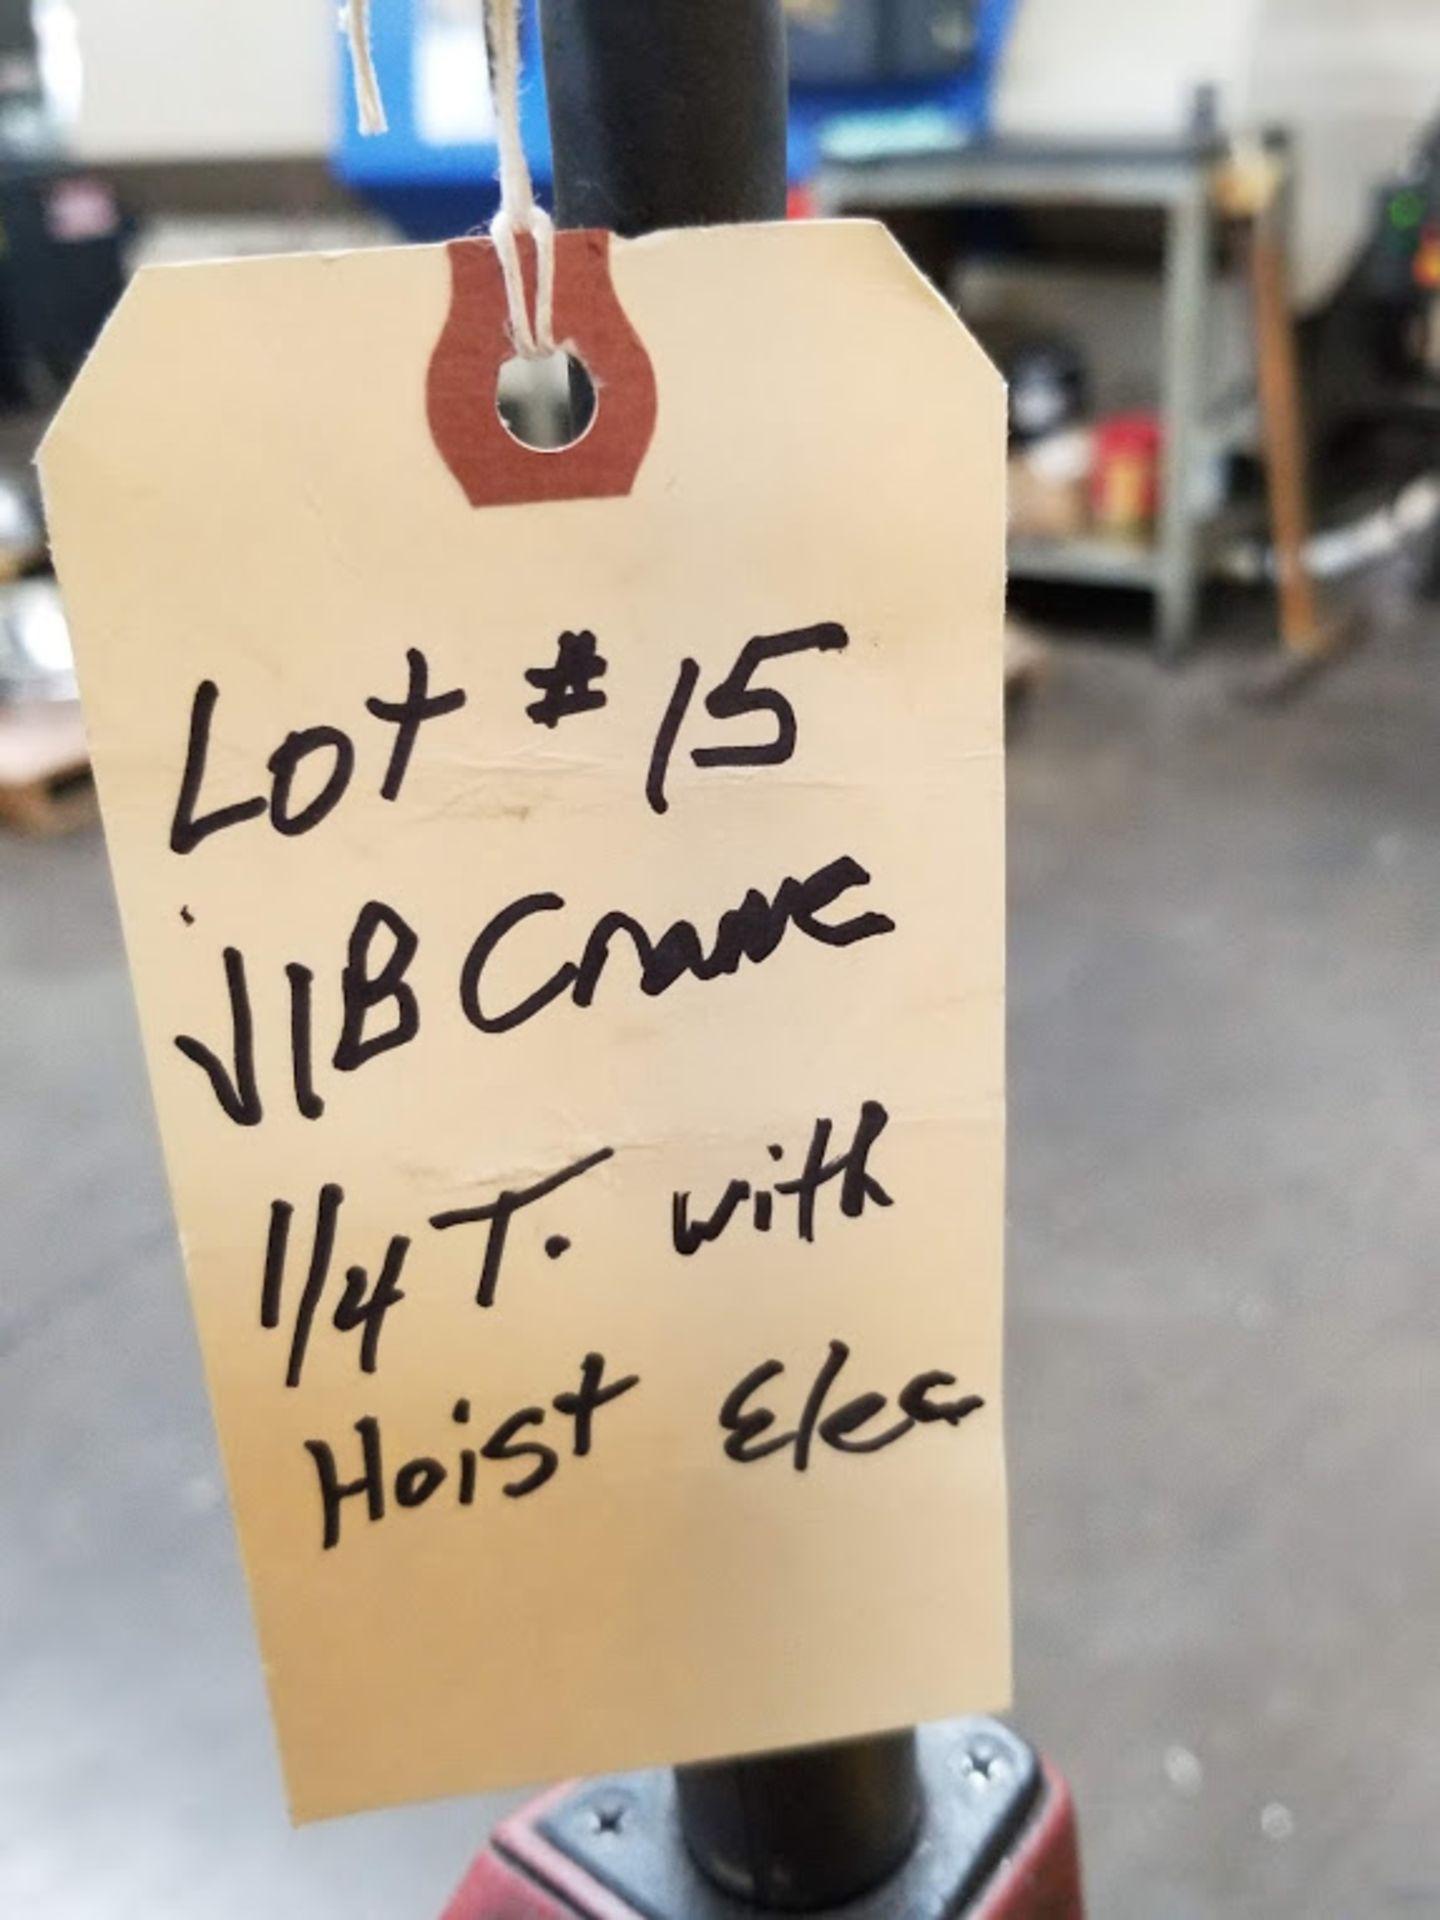 Lot 15 - JIB Crane 1/4 Ton with Trolley Rails & Dayton Electric Chain Hoist, 115 Volt